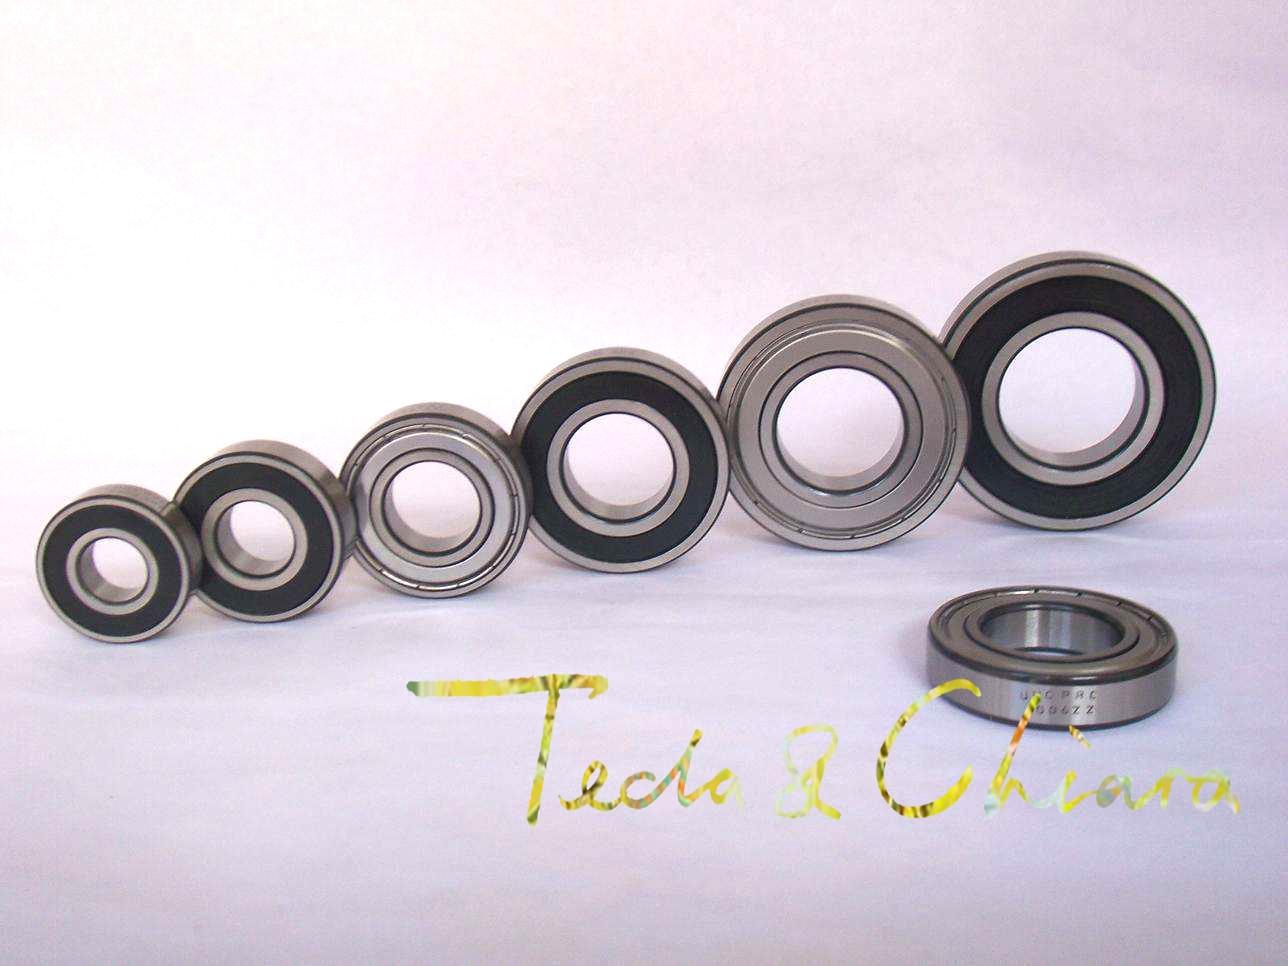 1//8x1//4x7//64inch Ball Bearings R144ZZ Metal Shielded Thin Wall Bearings 5pcs